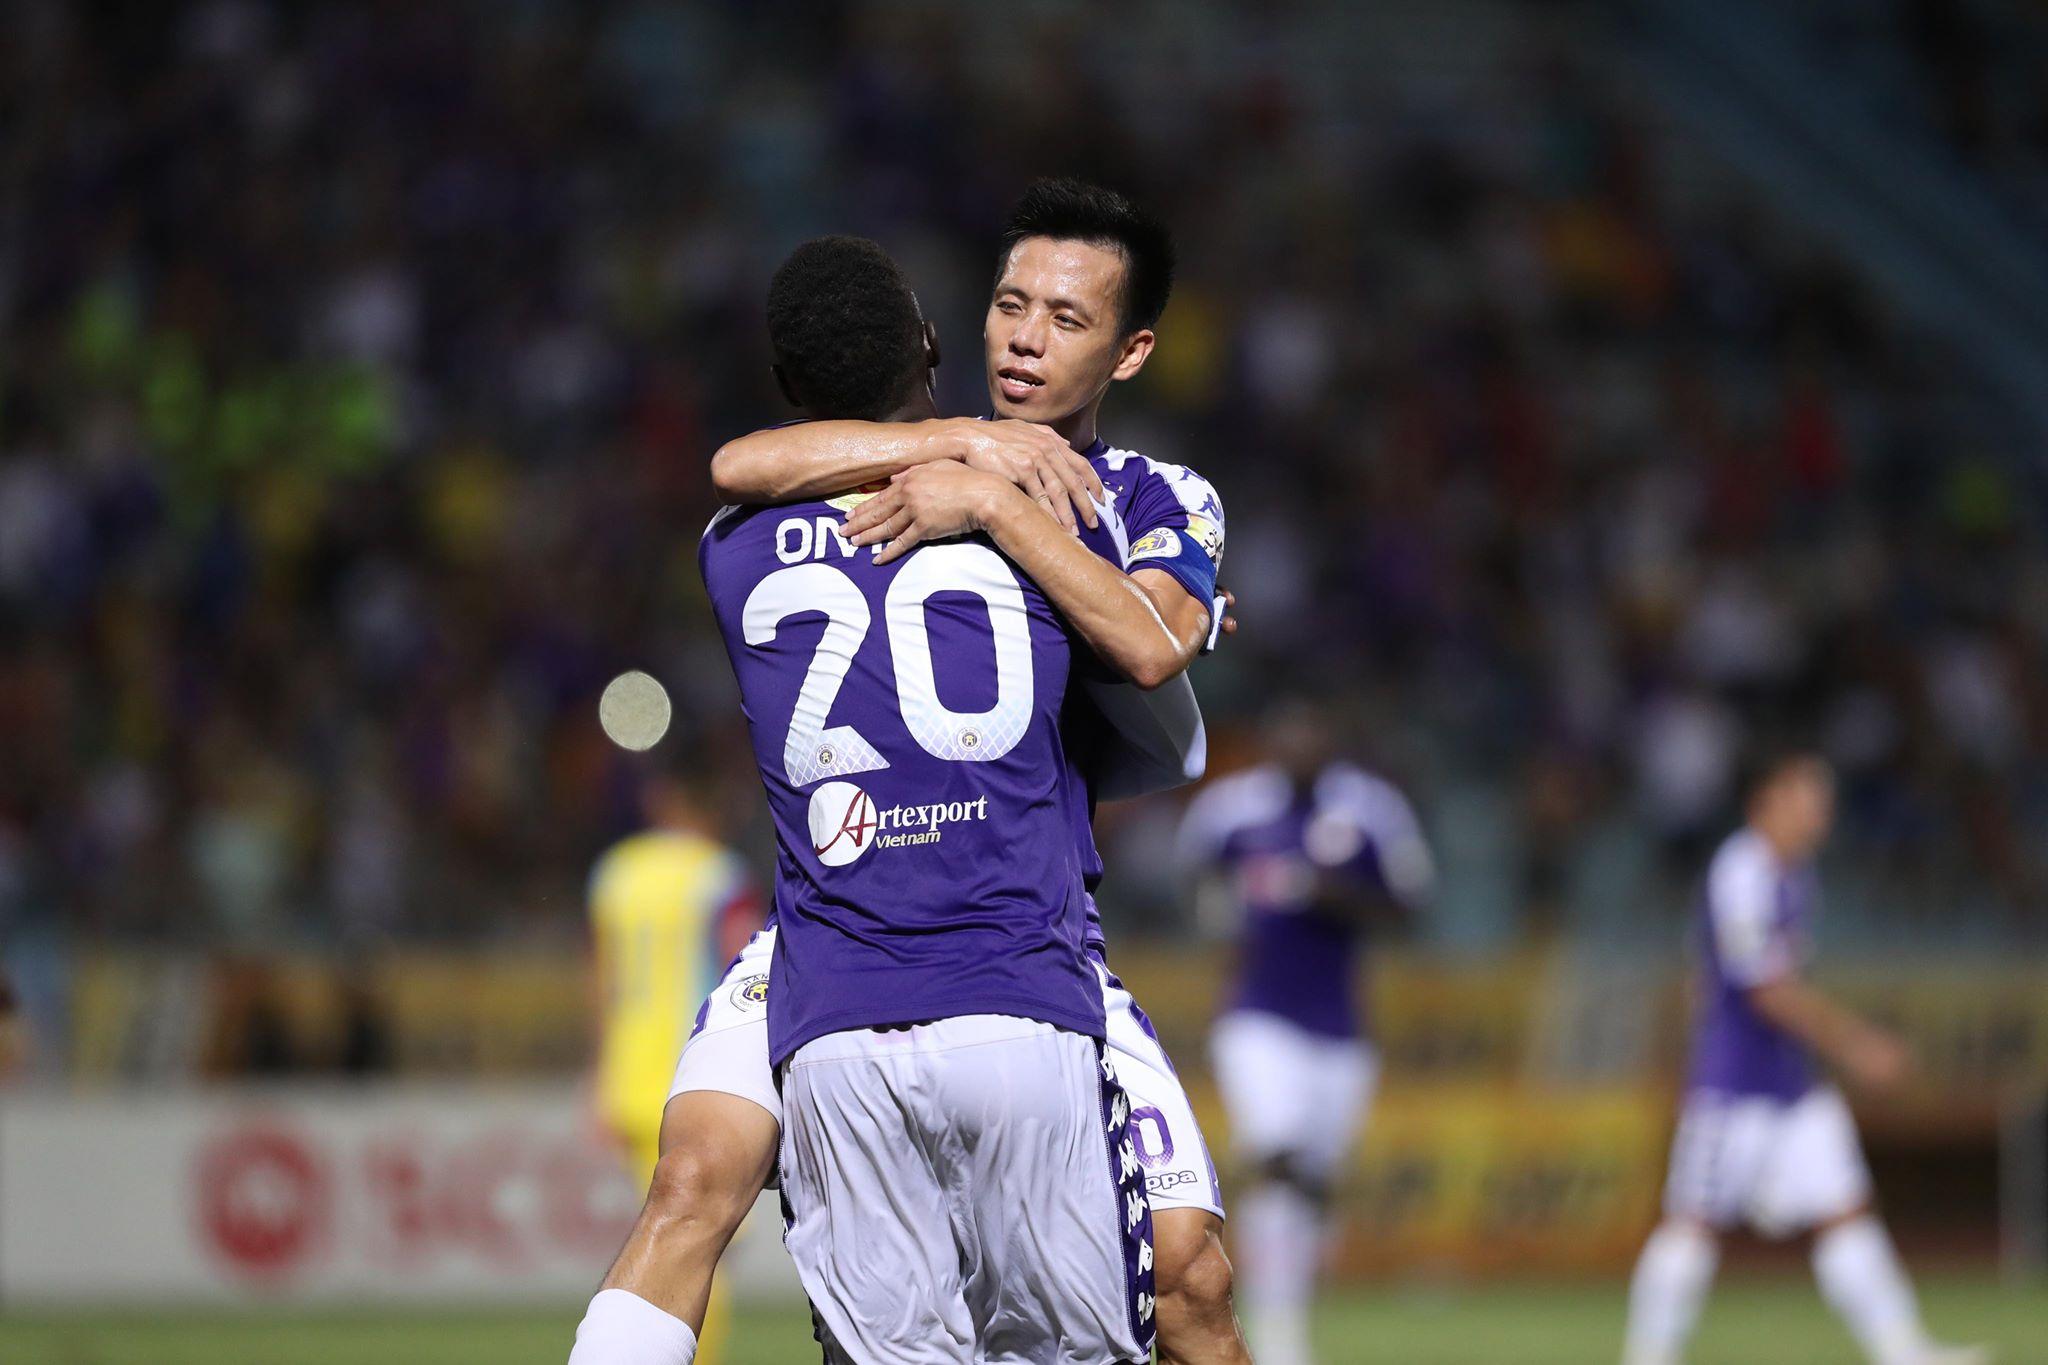 nhan dinh du doan vong 16 v league 2019 ha noi fc vs hagl